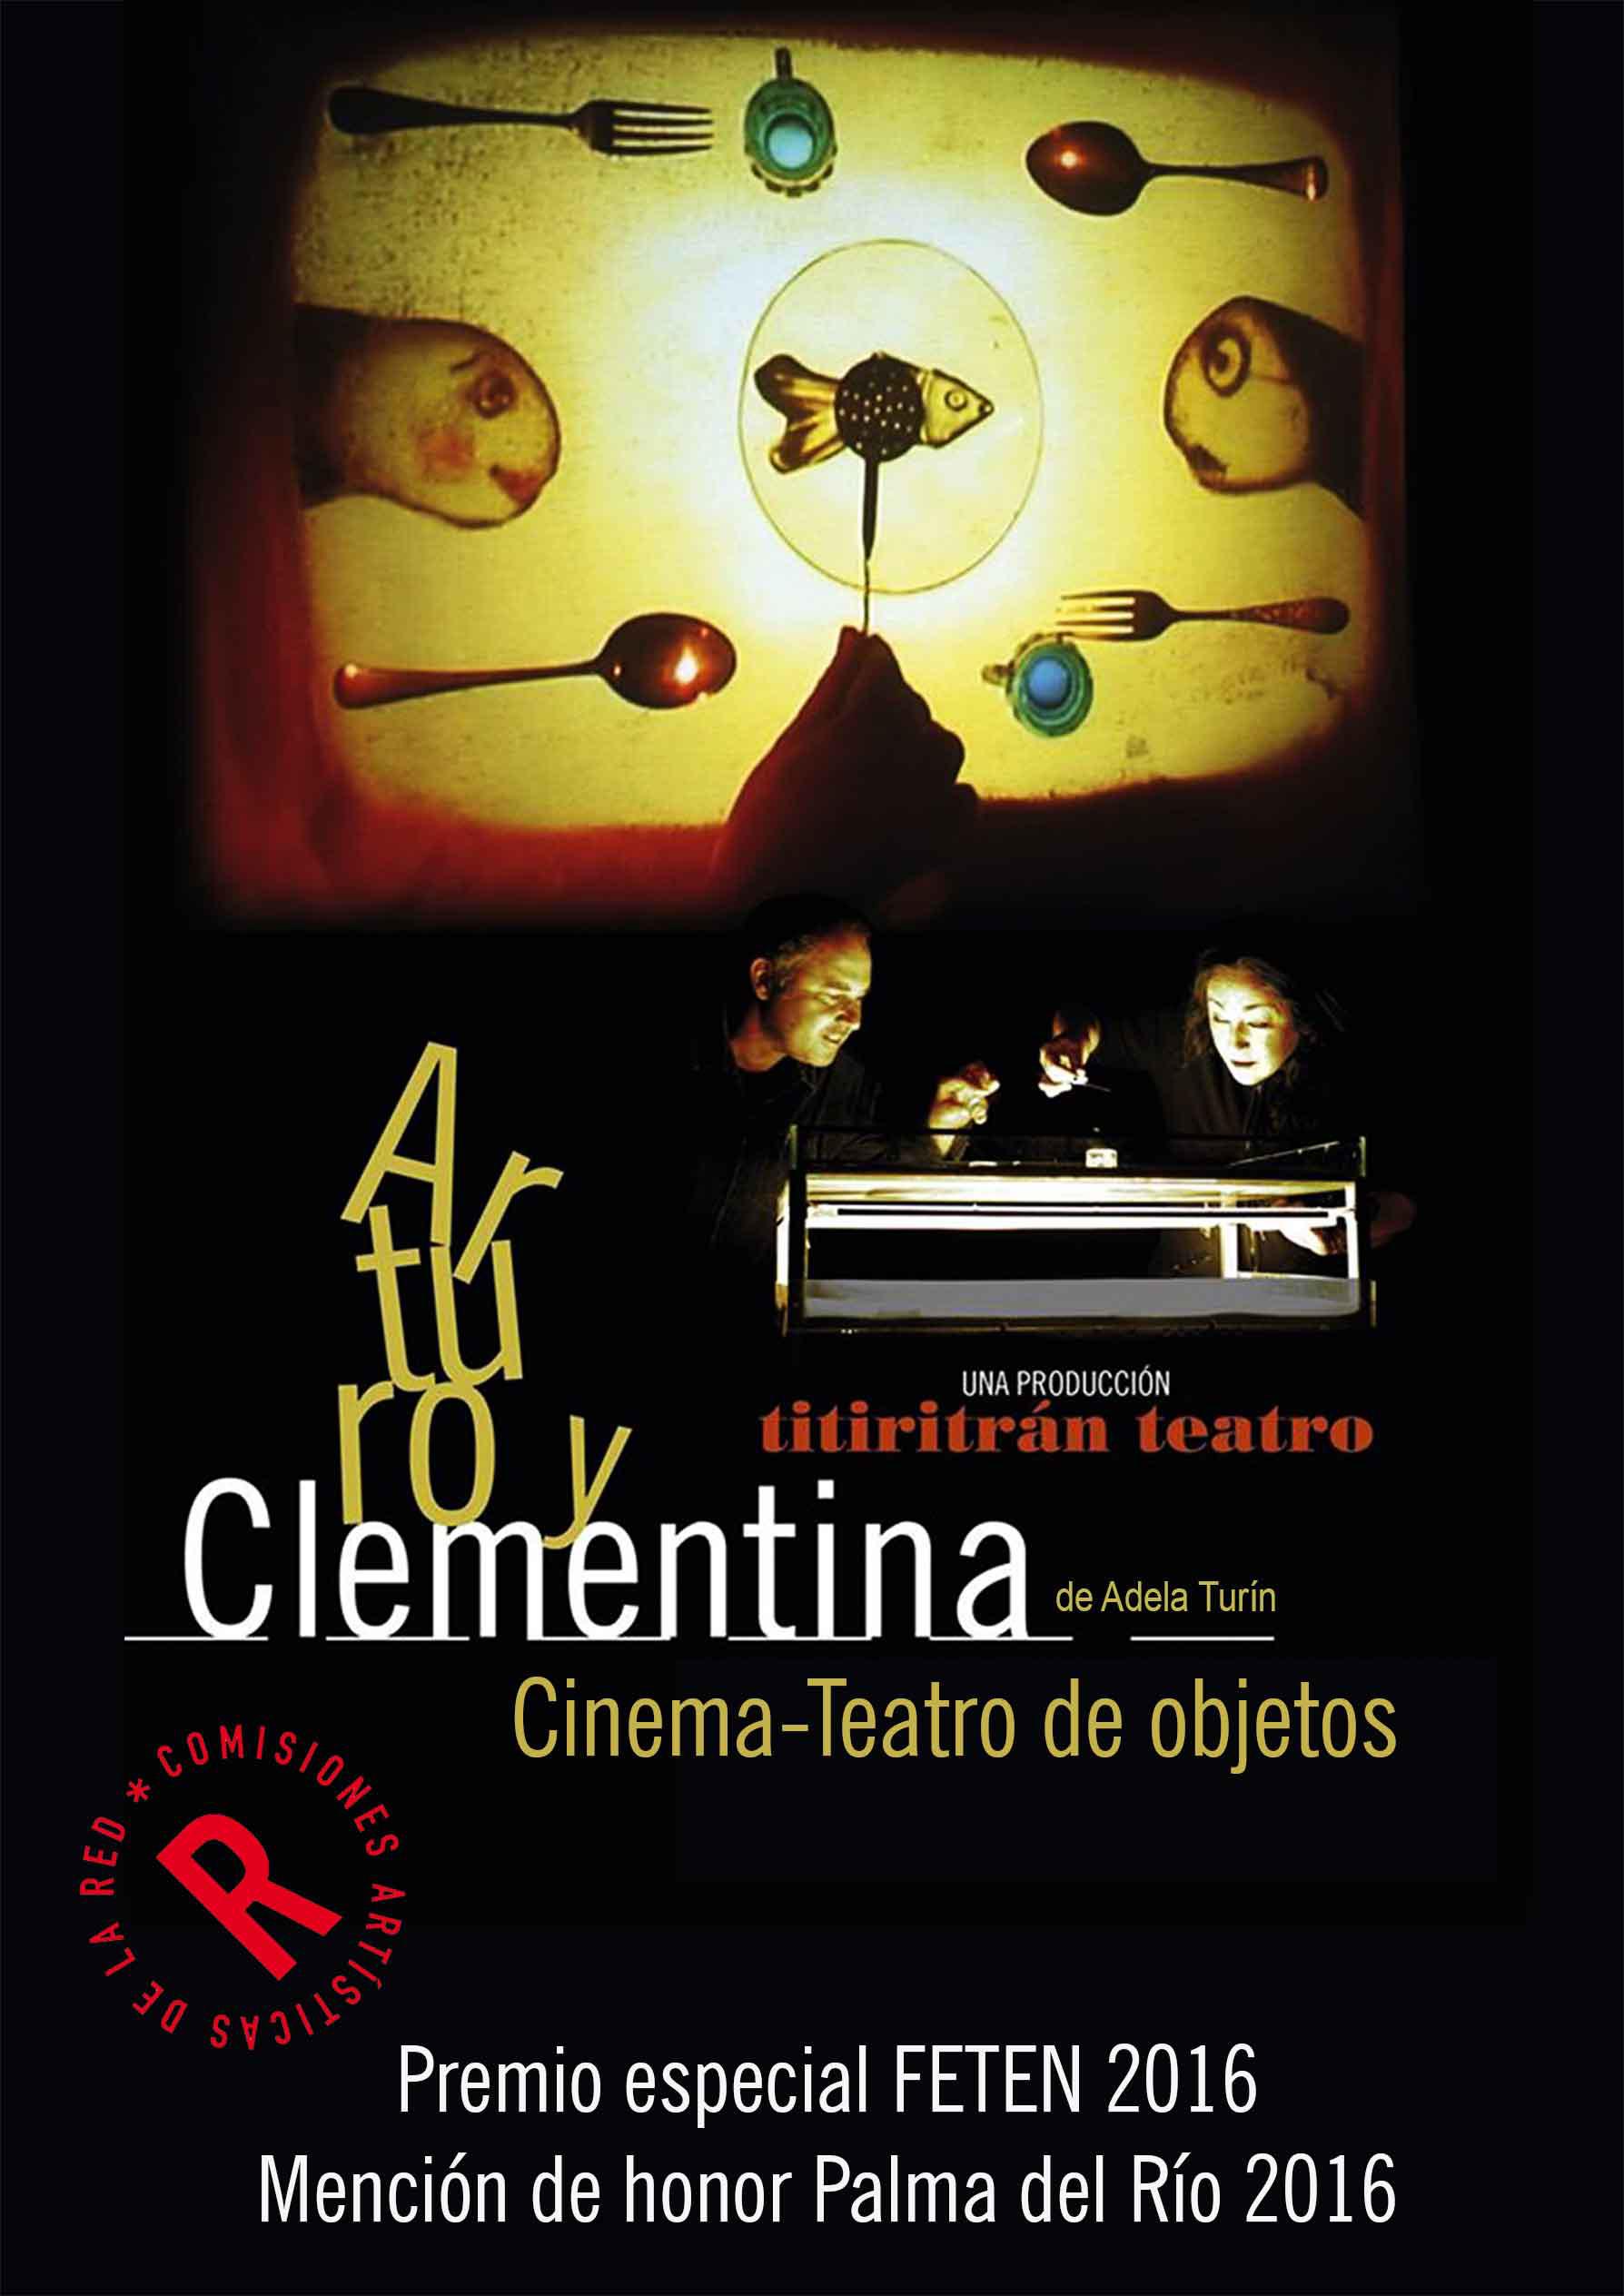 2Titiritrn--Arturo-y-Clementina